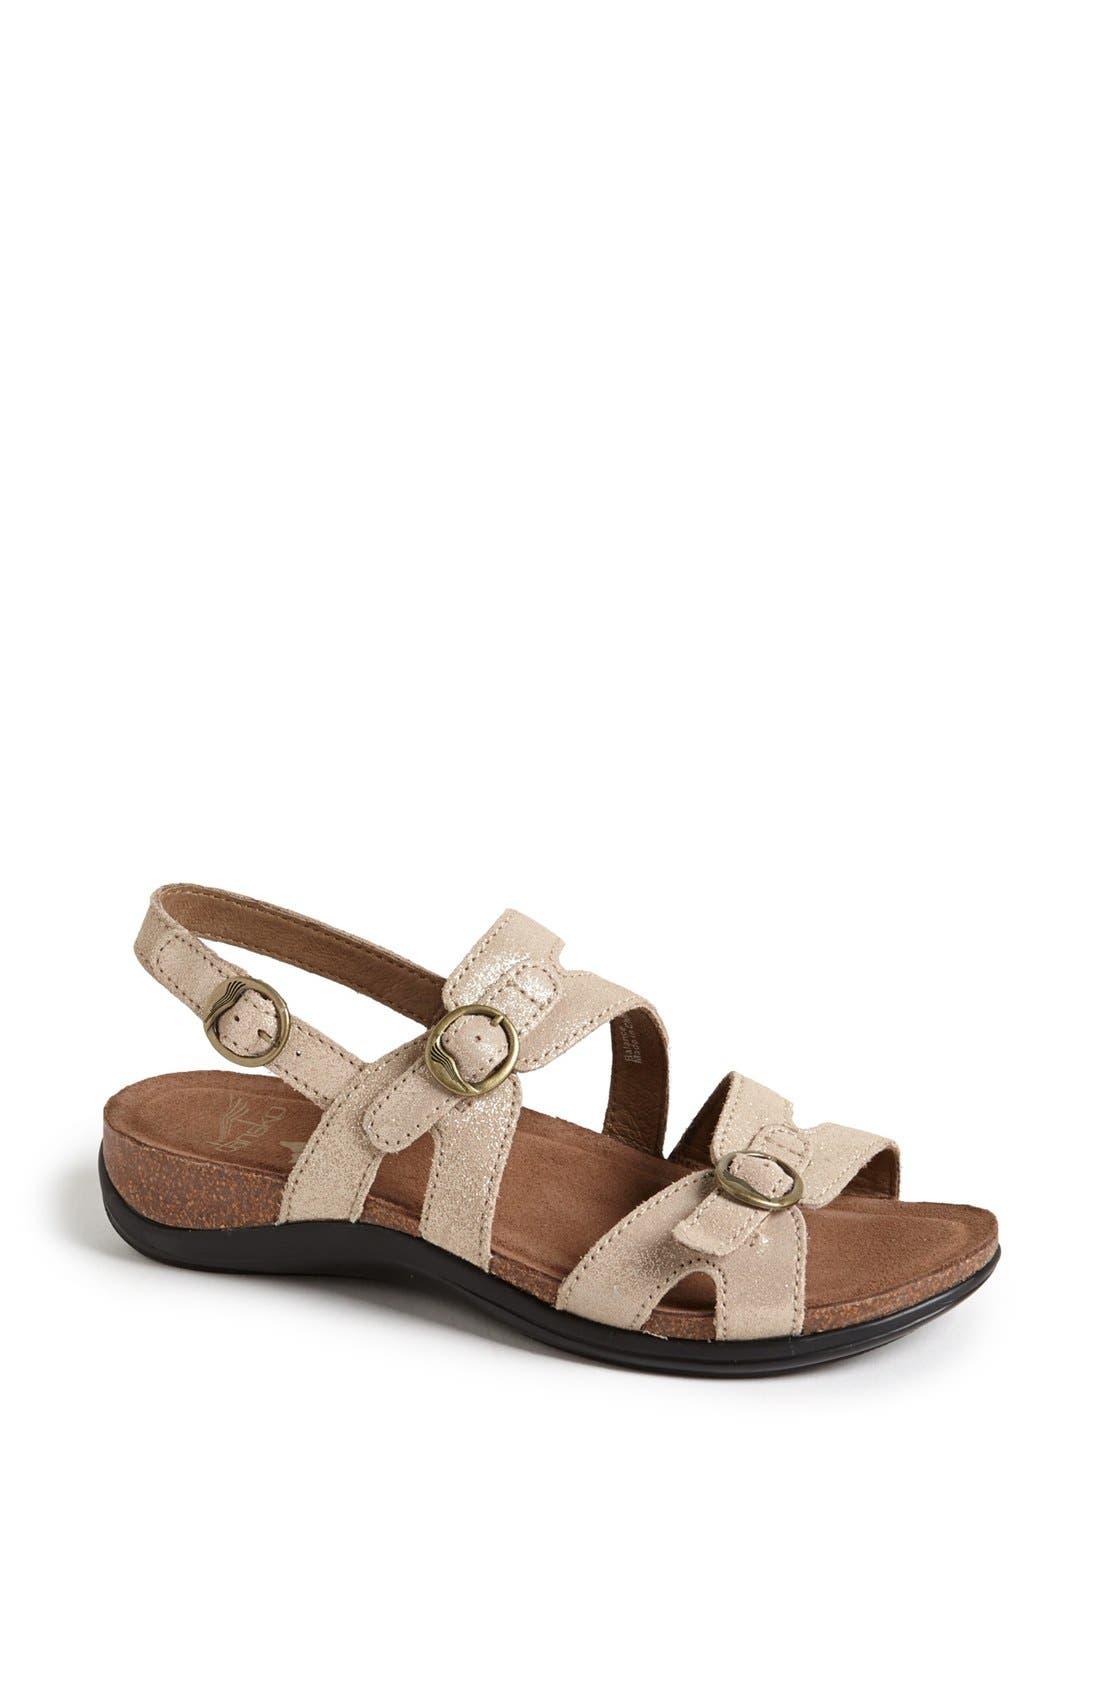 Main Image - Dansko 'Jameson' Leather Sandal